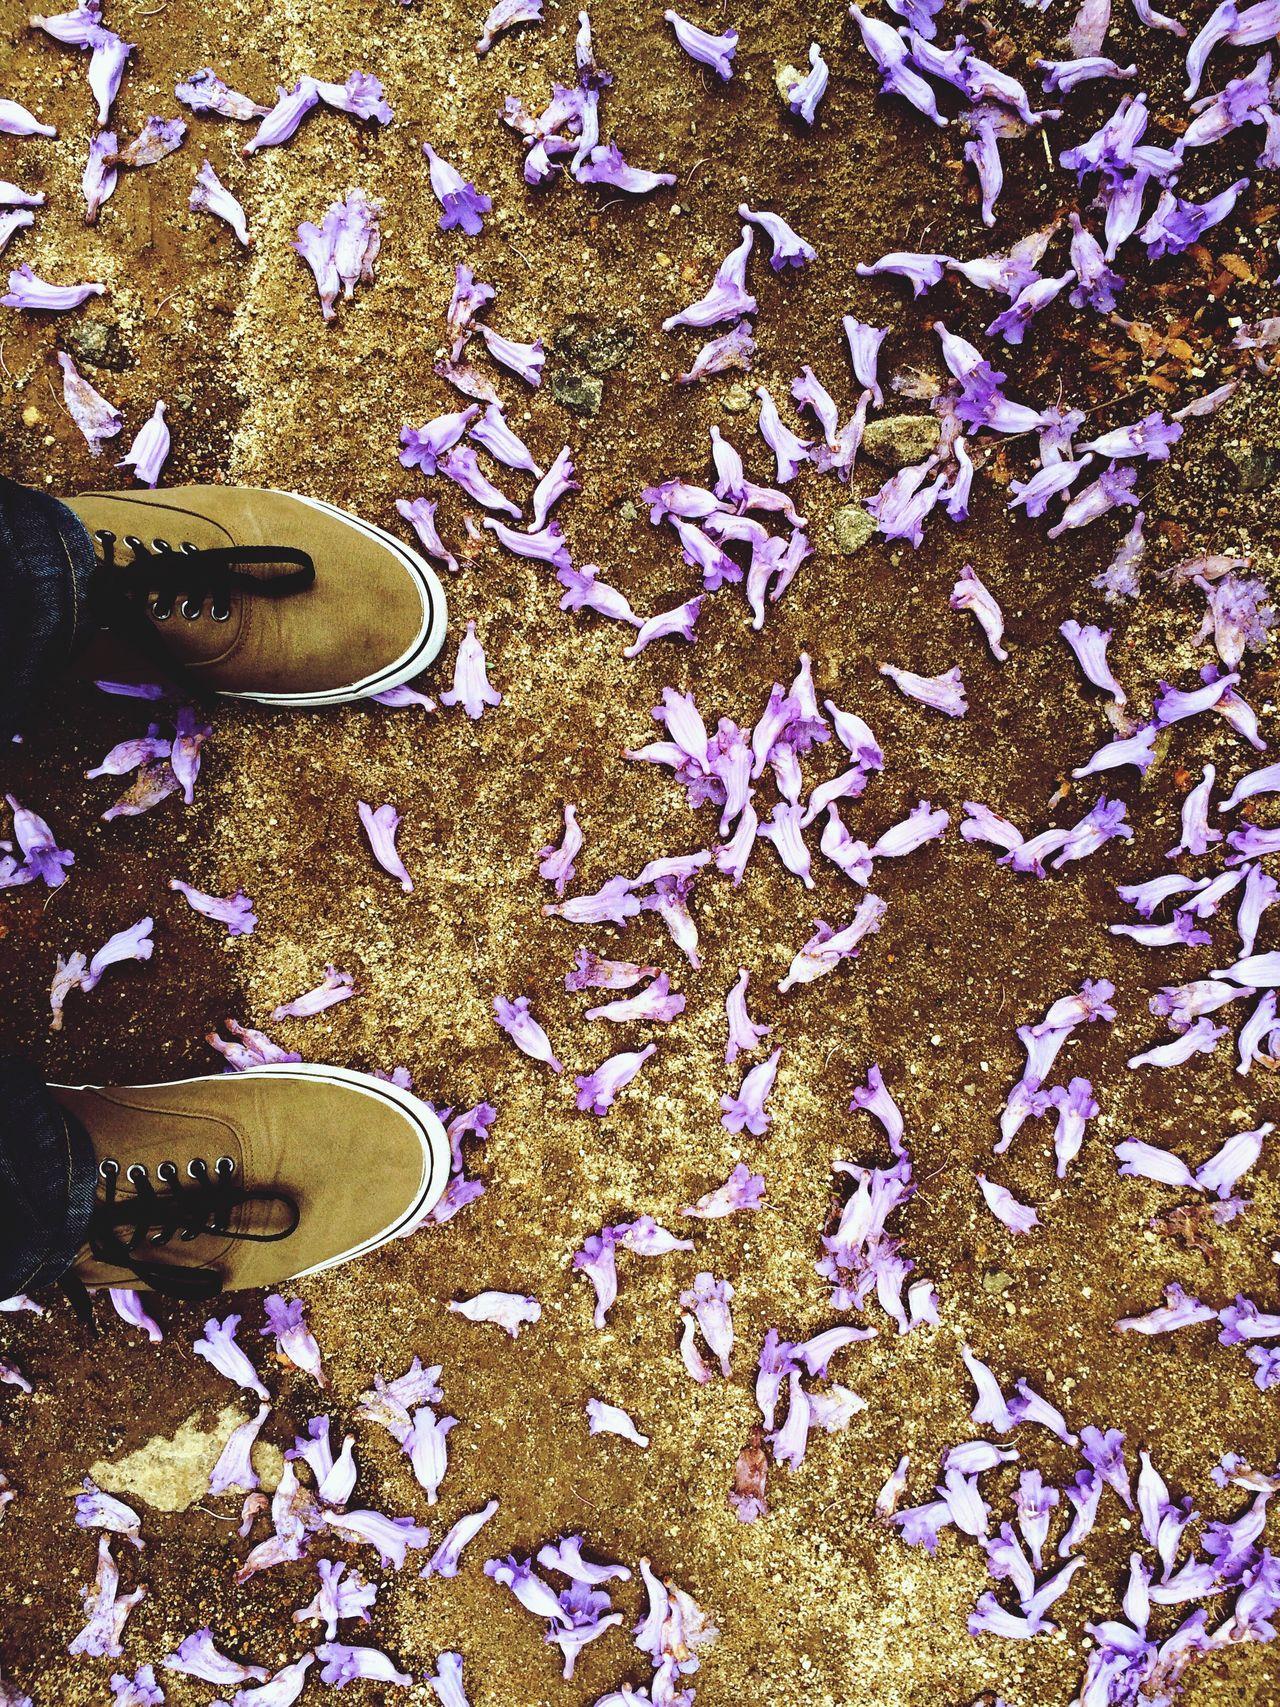 EyeEm Best Shots Eye4photography  EyeEm Gallery Fallen Manvsnature  IPhoneography Mypointofview Point Of View Ground Two Is Better Than One Eyeemphoto EyeEm EyeEm Nature Lover EyeEmBestPics Eyem Gallery